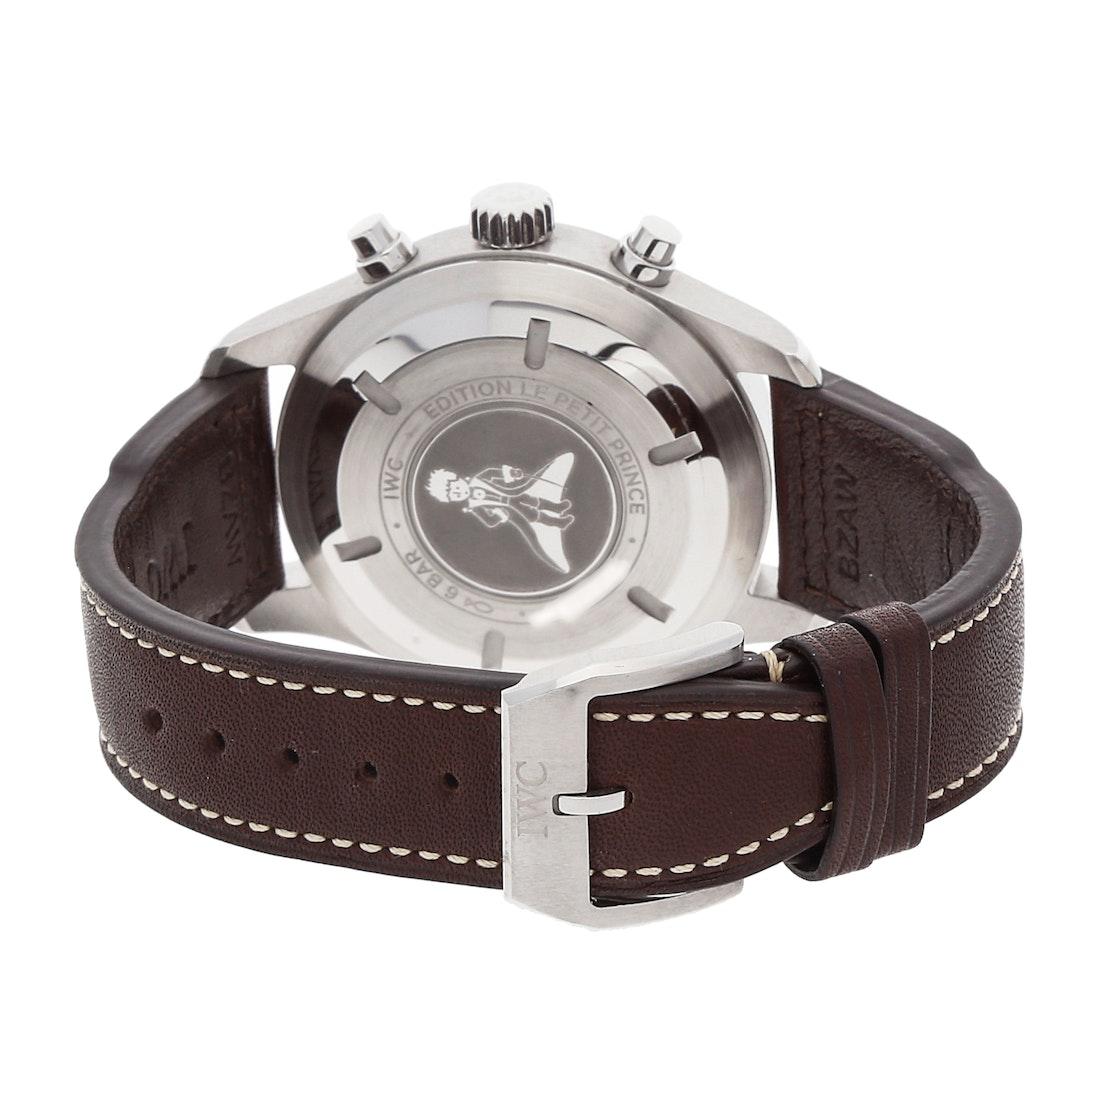 "IWC Pilot's Watch Chronograph ""Le Petit Prince"" IW3777-14"